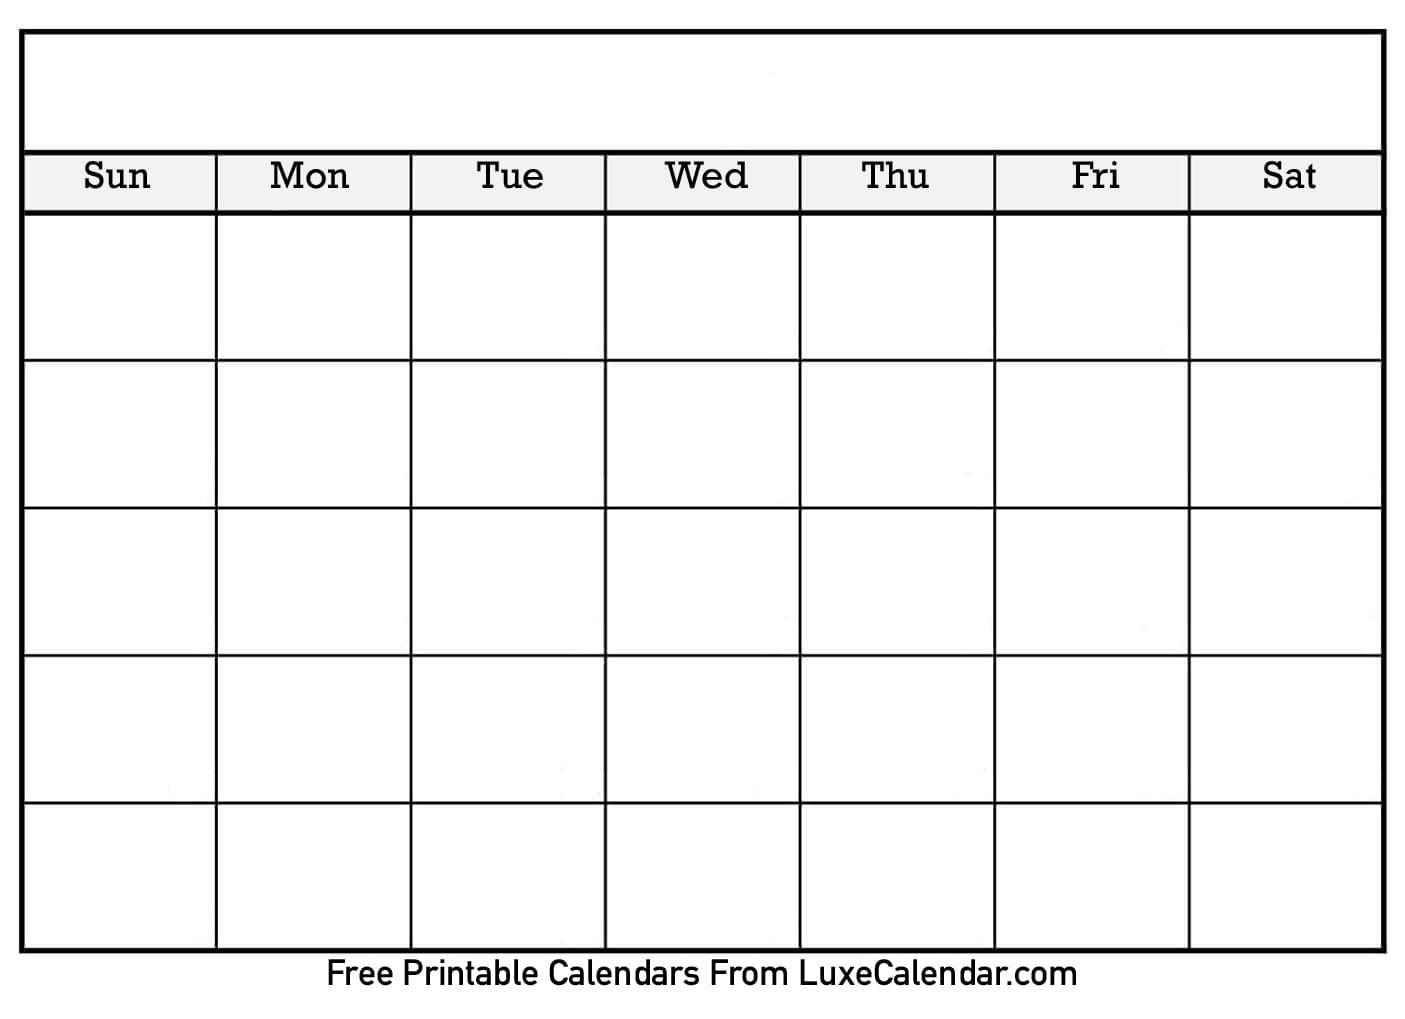 Blank Printable Calendar - Luxe Calendar with Template Of A Blank Calendar Of A Month